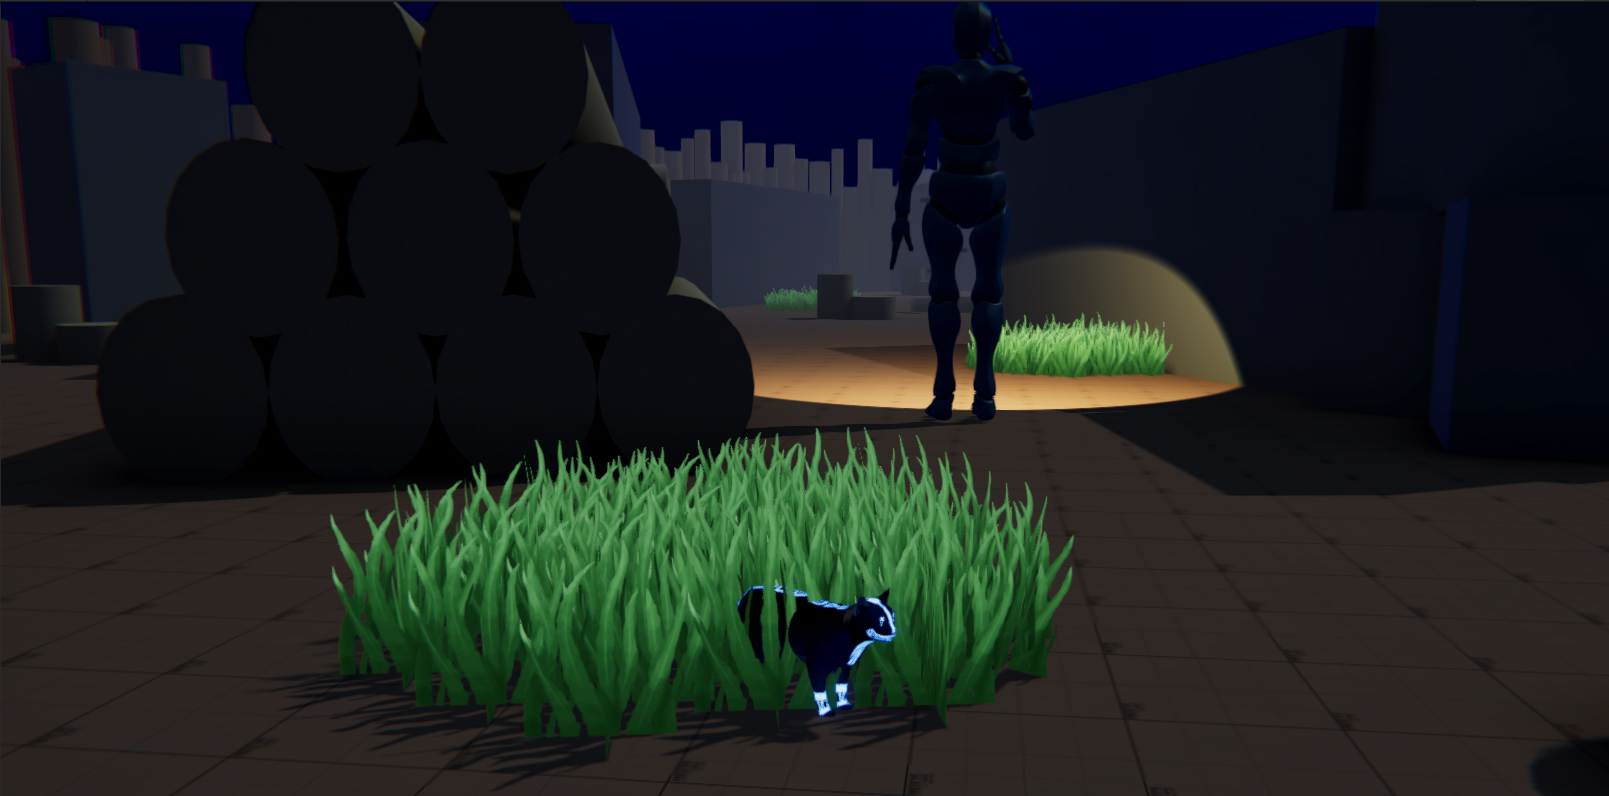 Jaguarundi, a playable character